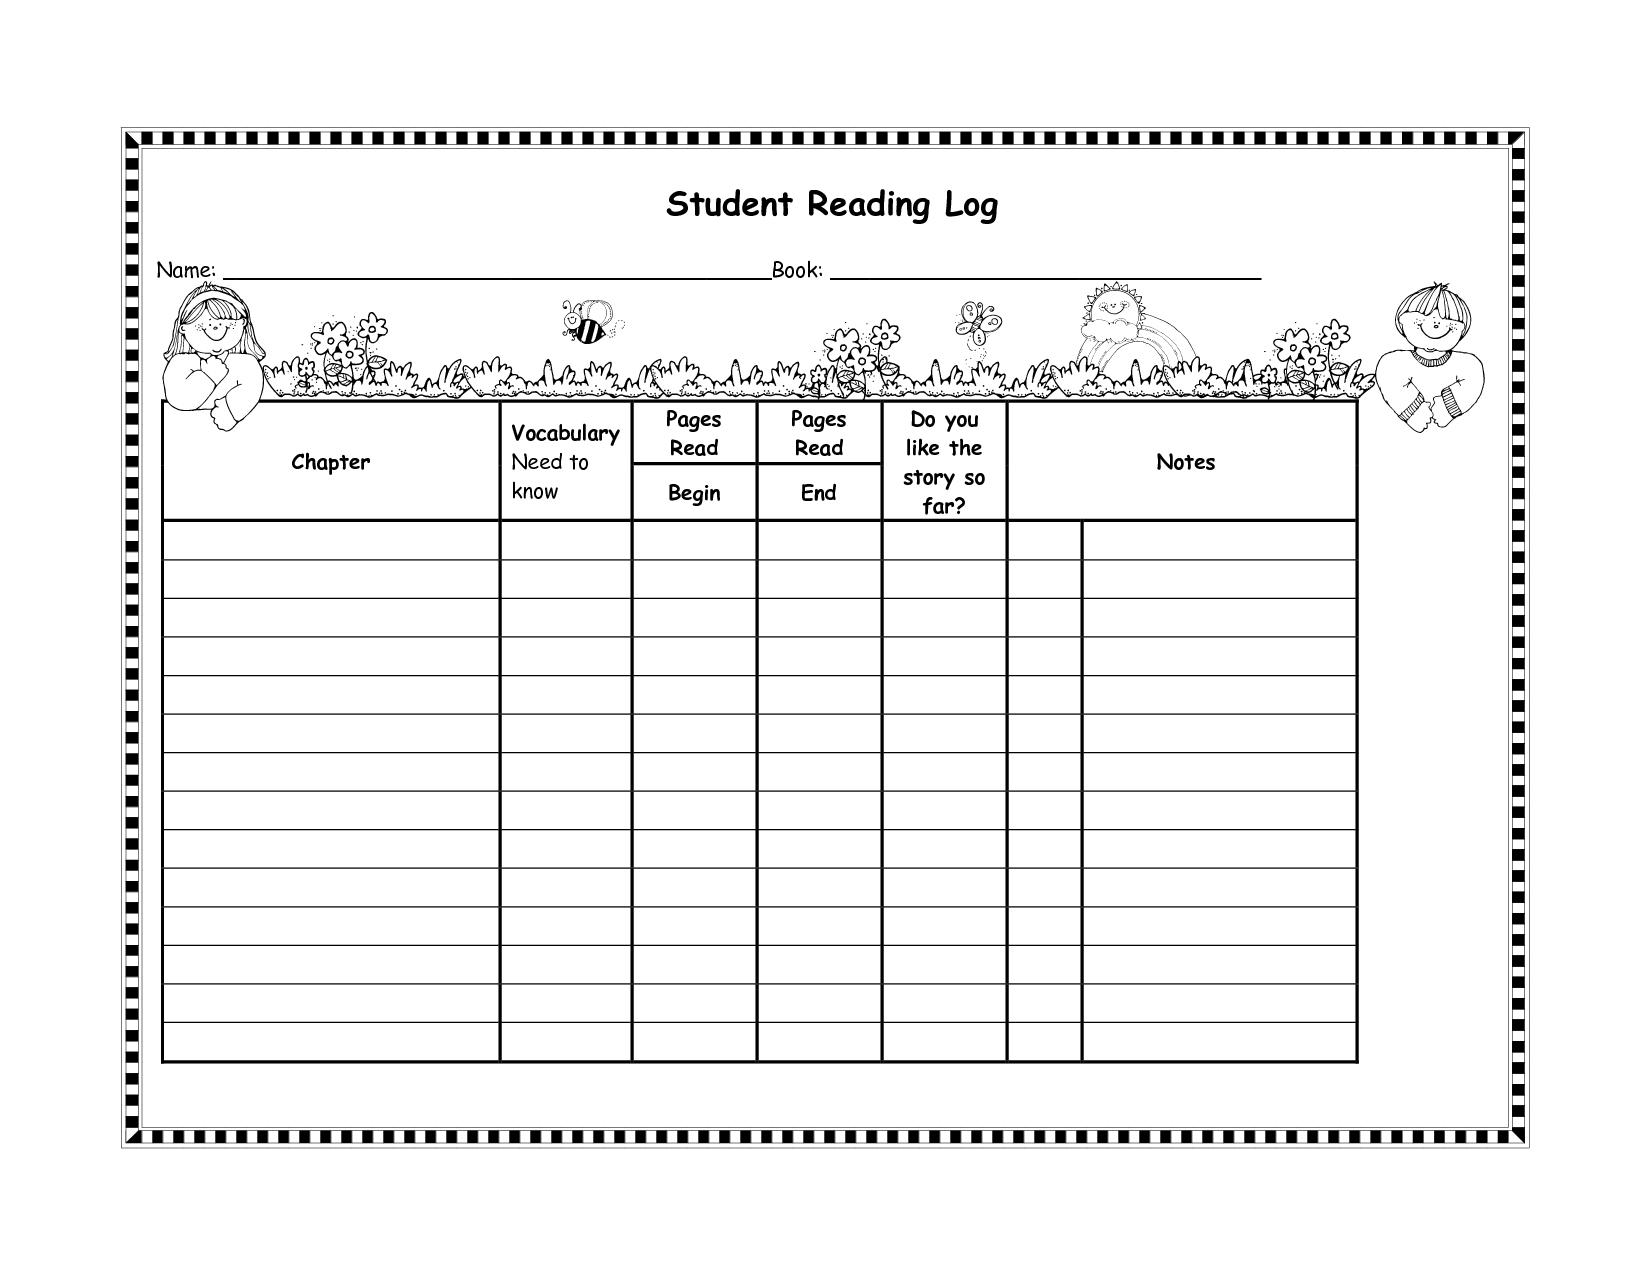 Student Reading Log Template | Management Teaching Ideas ...